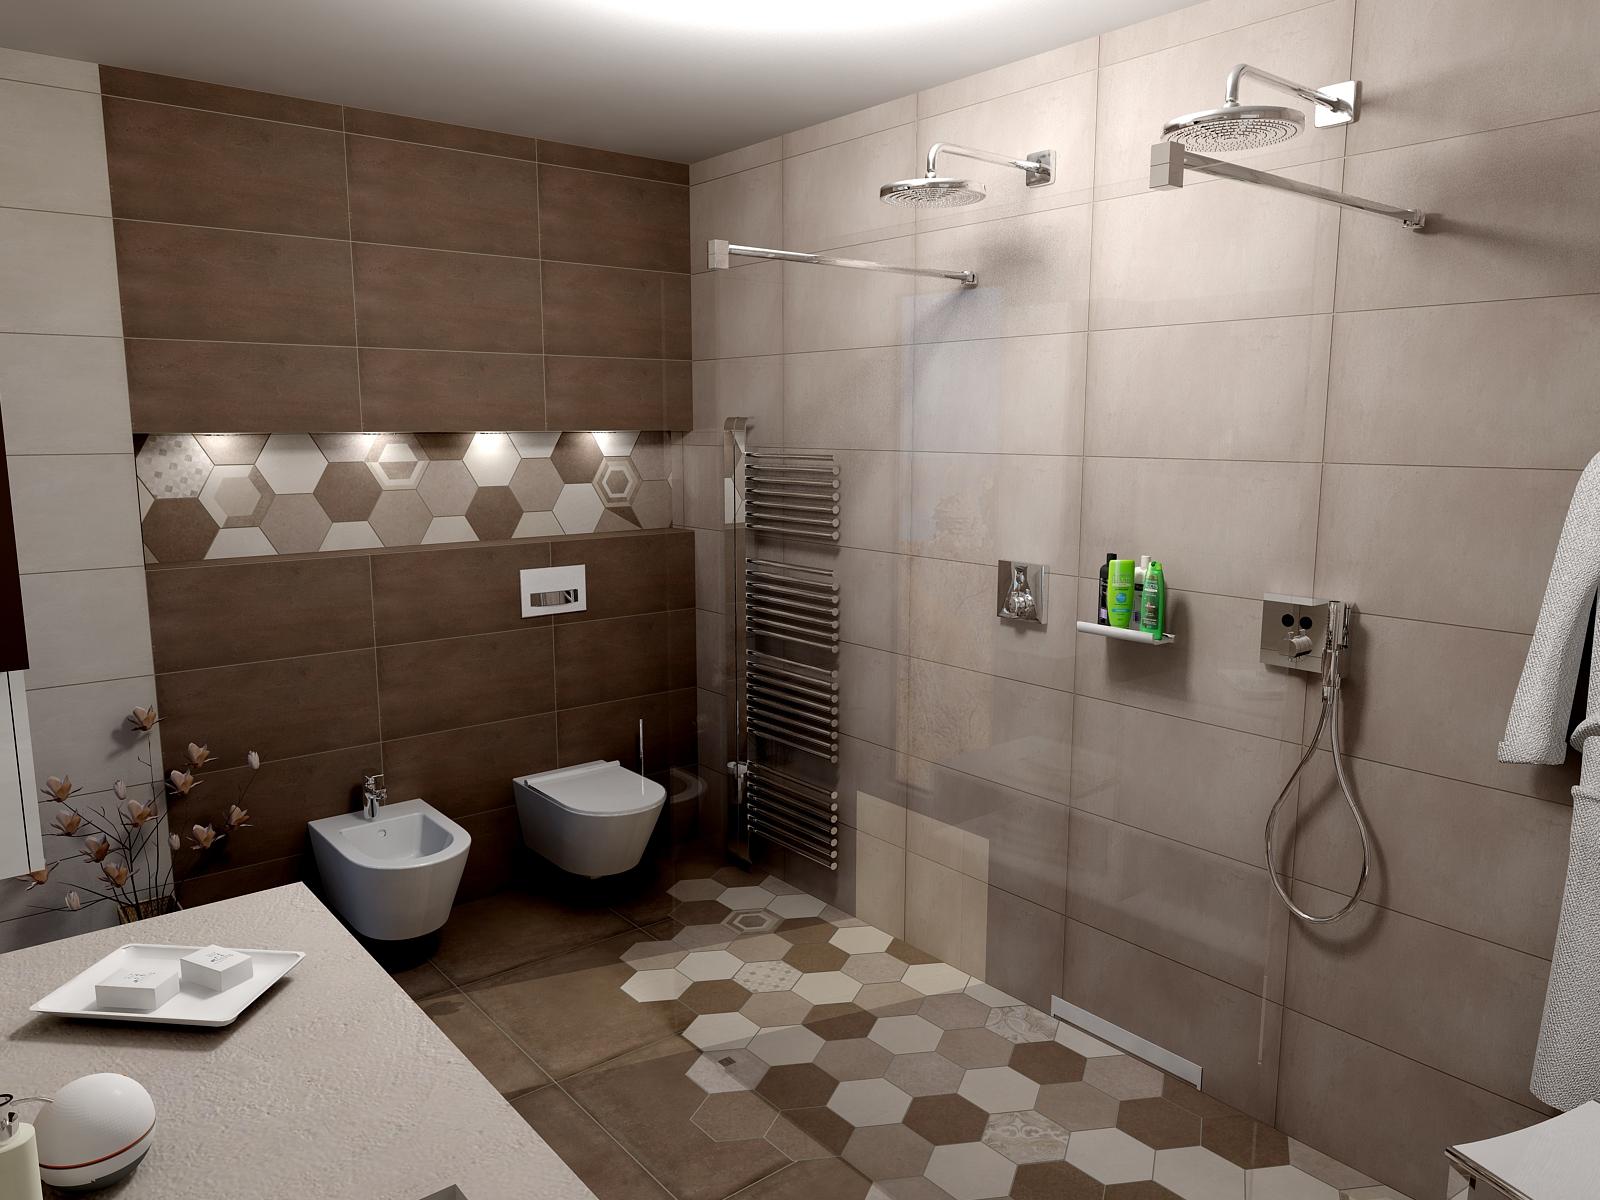 ragno rewind bathroom by mitja paliska d o o paliska d o o on visoft360 portal. Black Bedroom Furniture Sets. Home Design Ideas